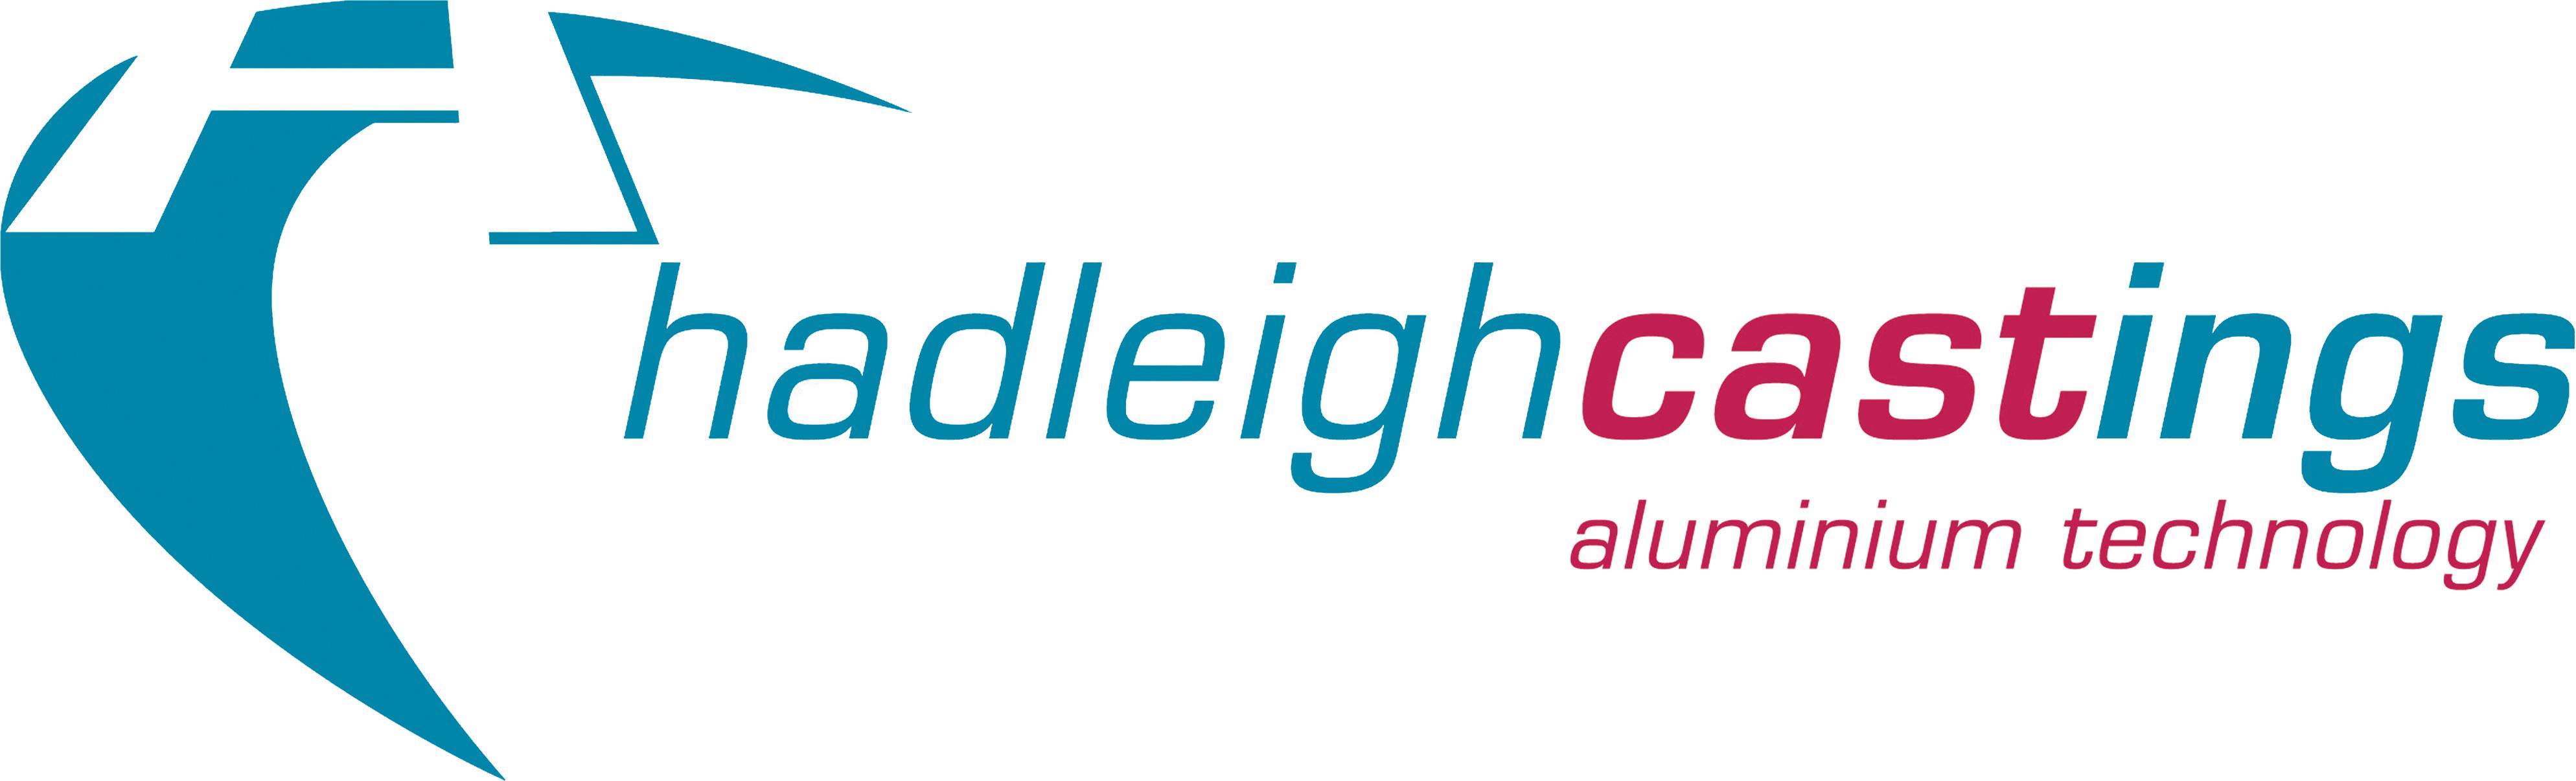 Hadleigh Castings